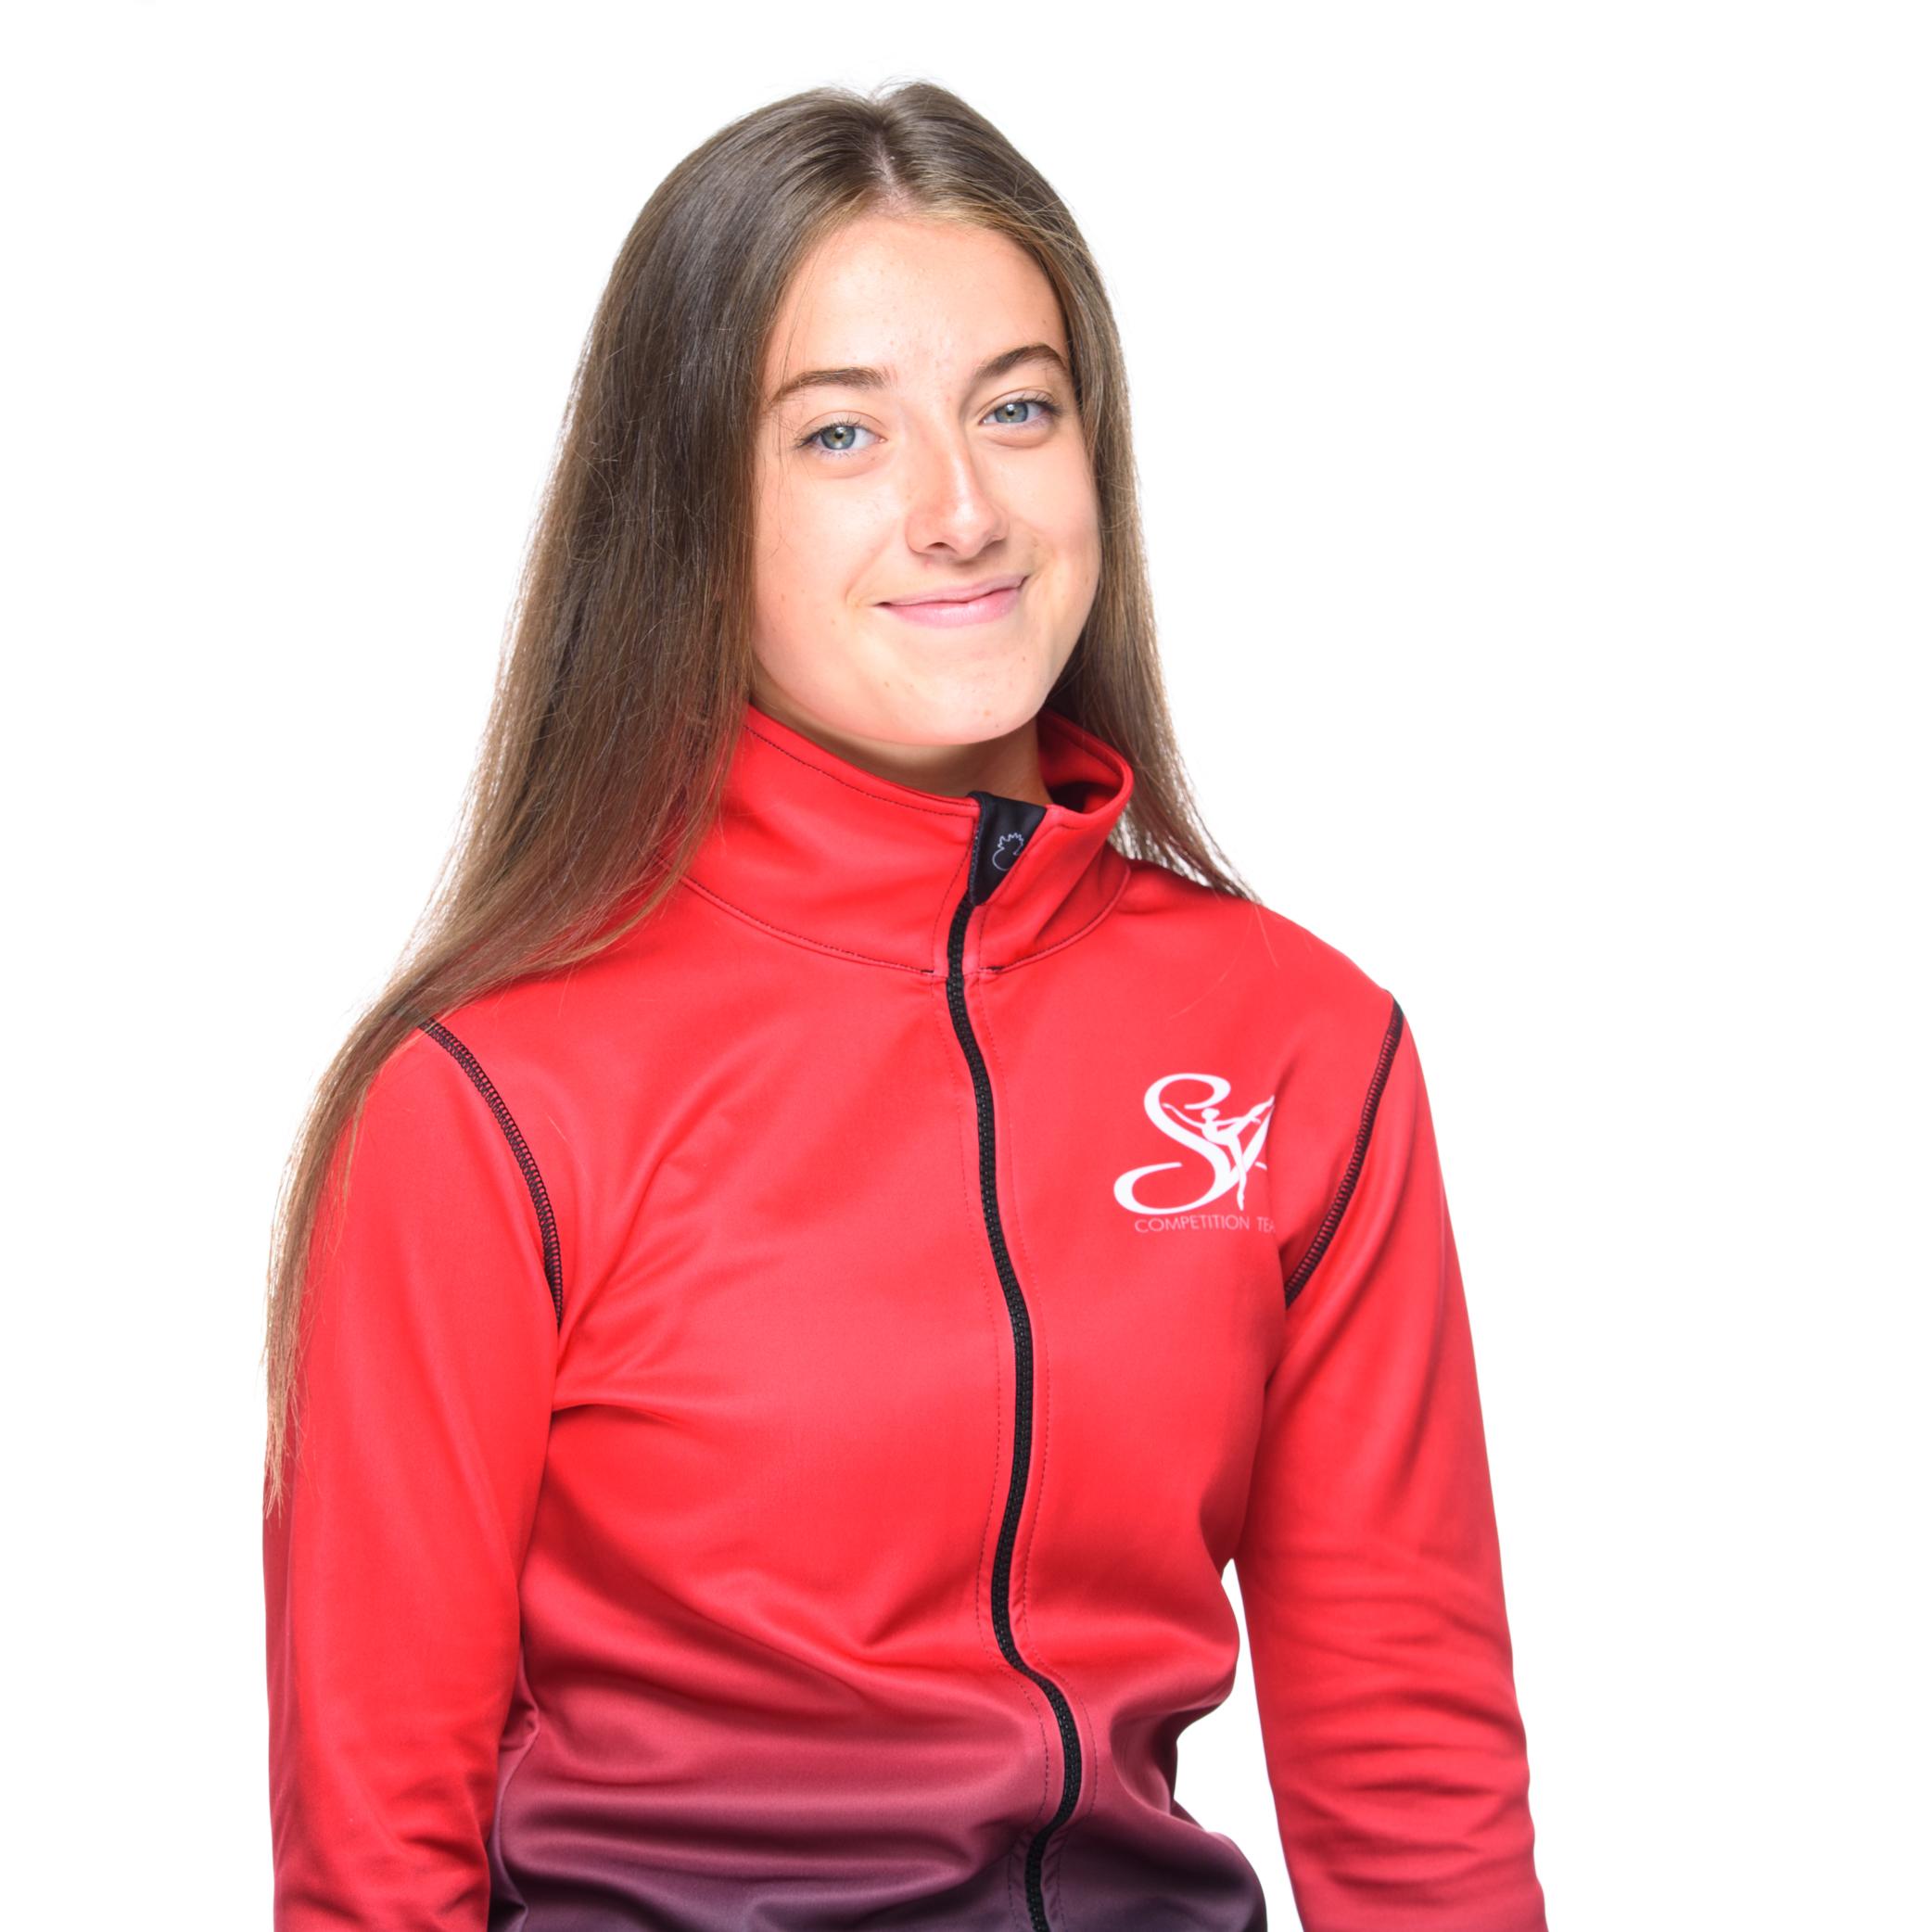 Caitlin Tonkin